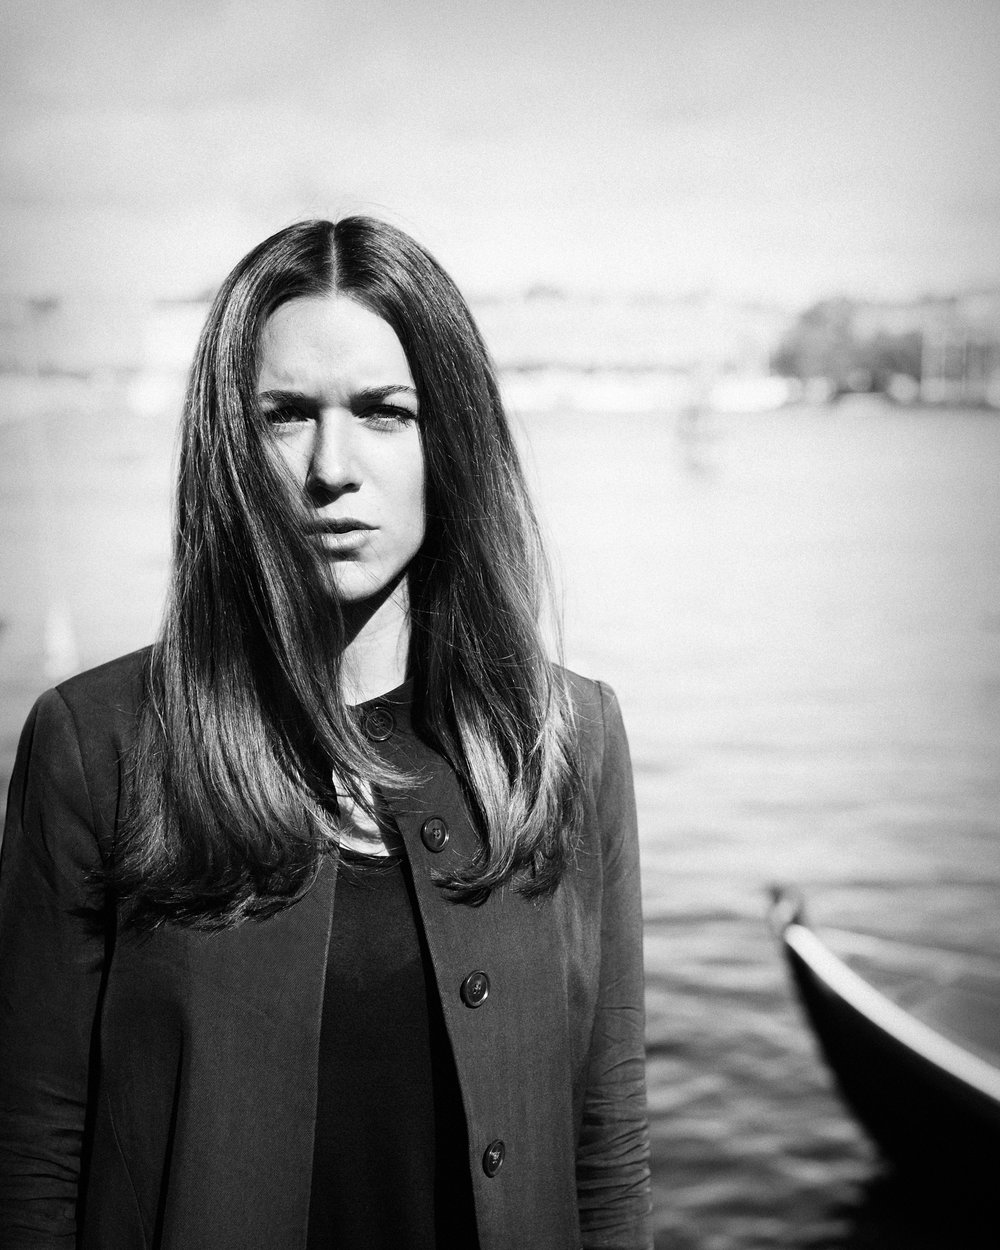 portraits_image__Kristofer Samuelsson Photography 2014-285.jpg